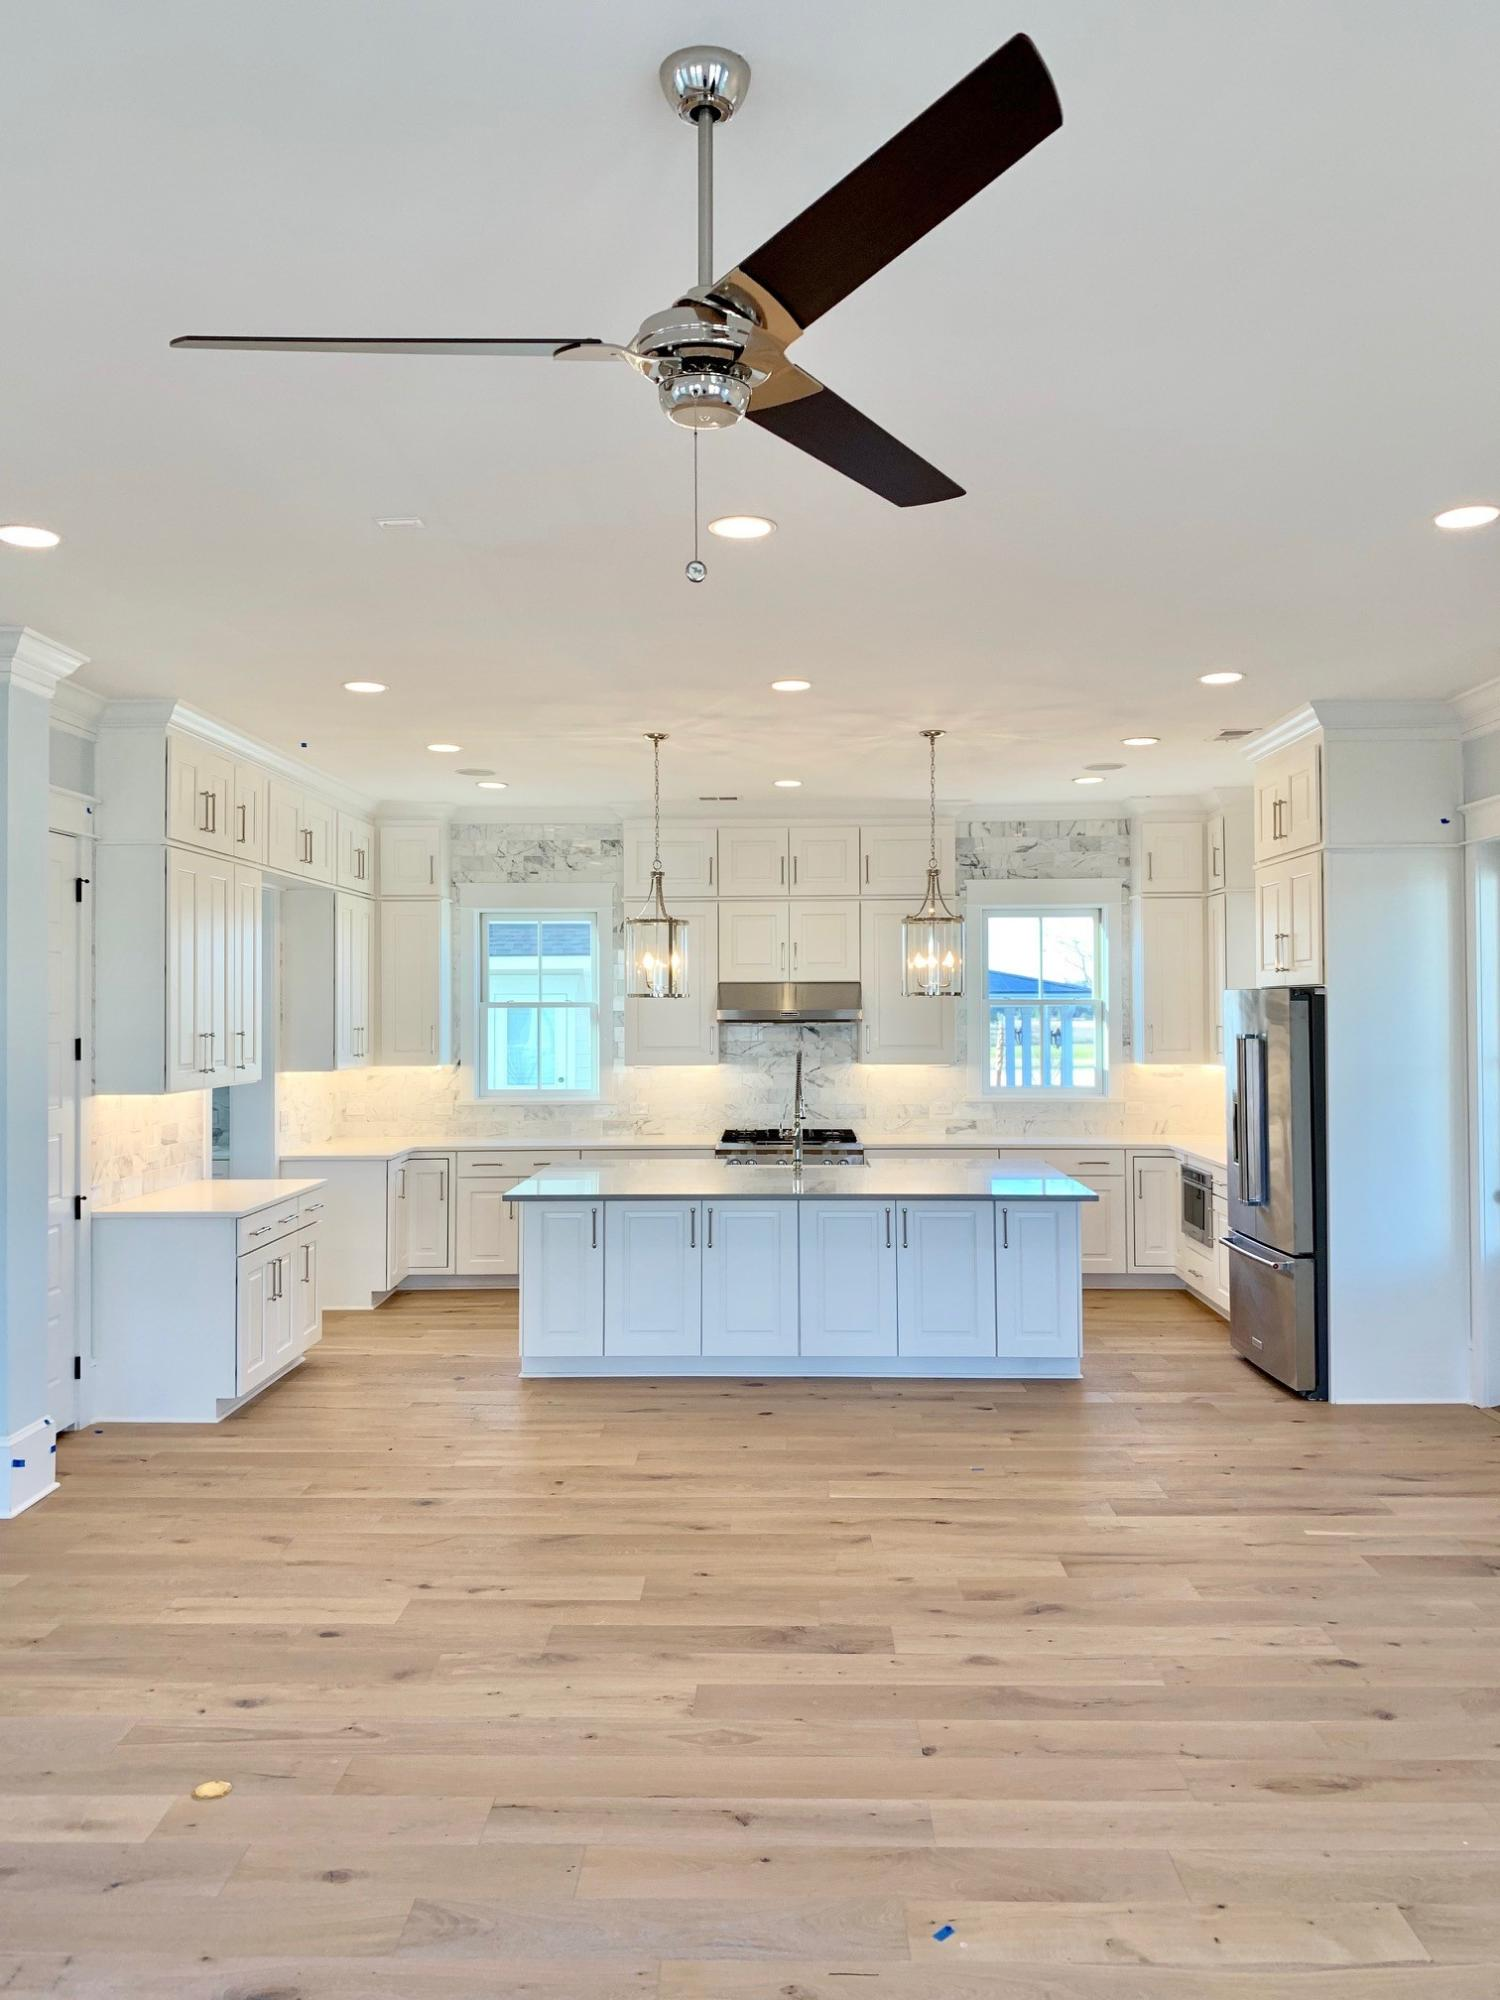 Daniel Island Homes For Sale - 206 Foundry, Charleston, SC - 21